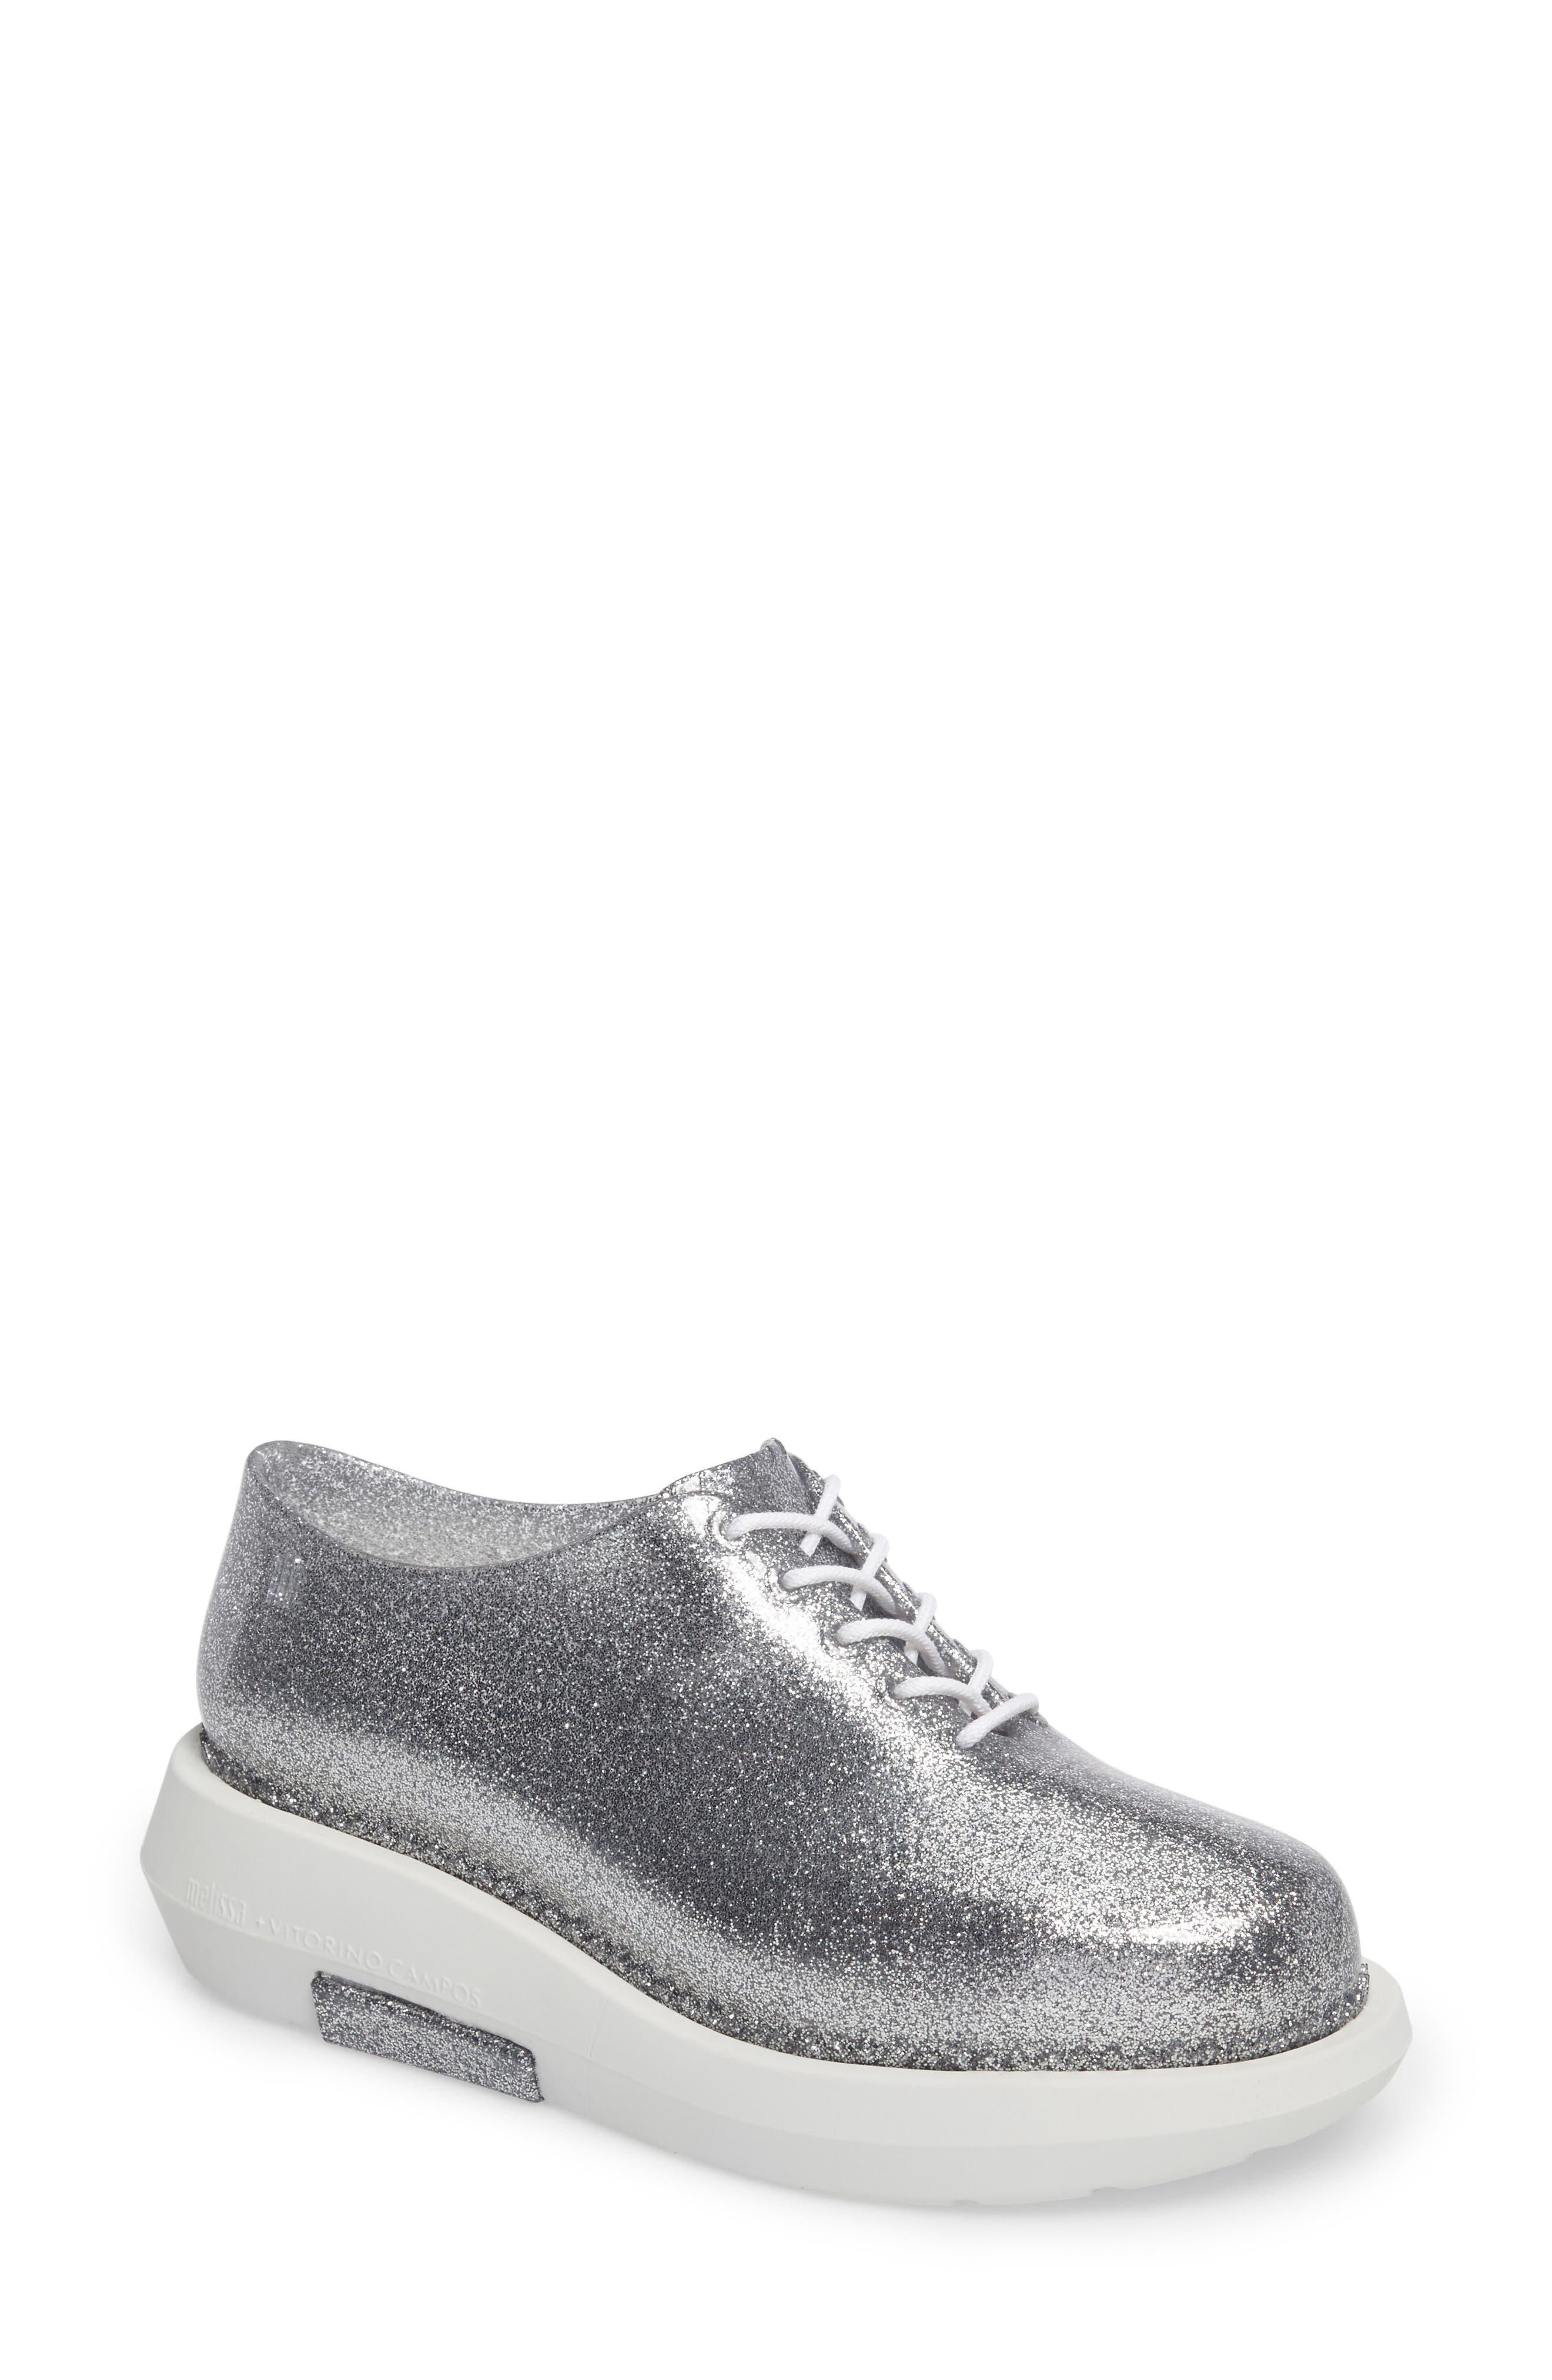 Grunge Vitorino Water Resistant Oxford,                         Main,                         color, Silver Glitter White